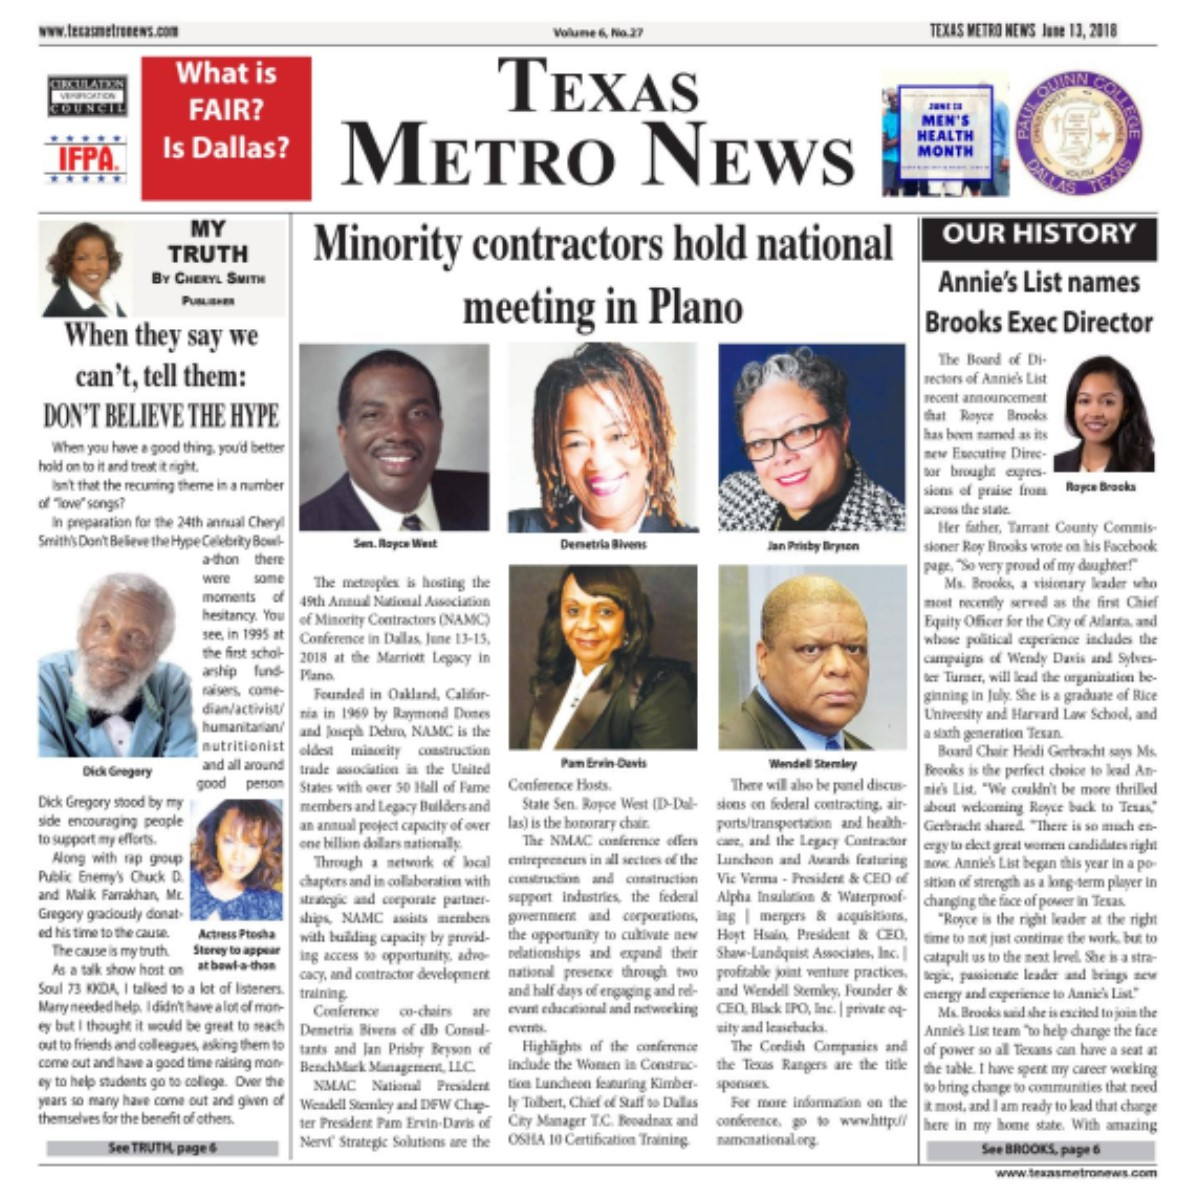 Texas Metro News: 6/13/18